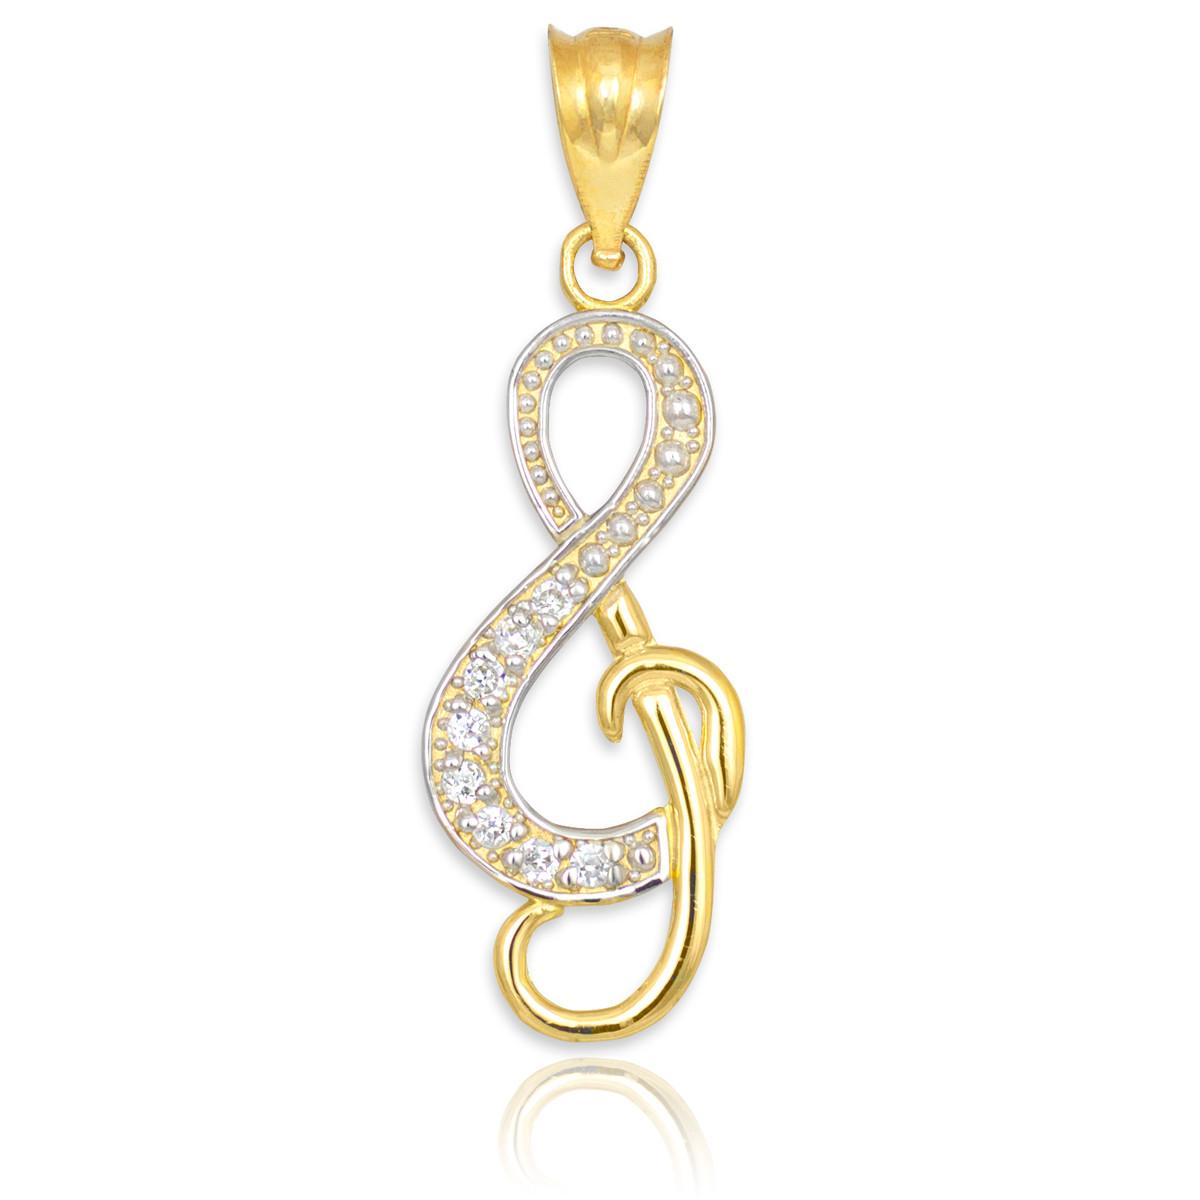 studded gold treble clef charm pendant